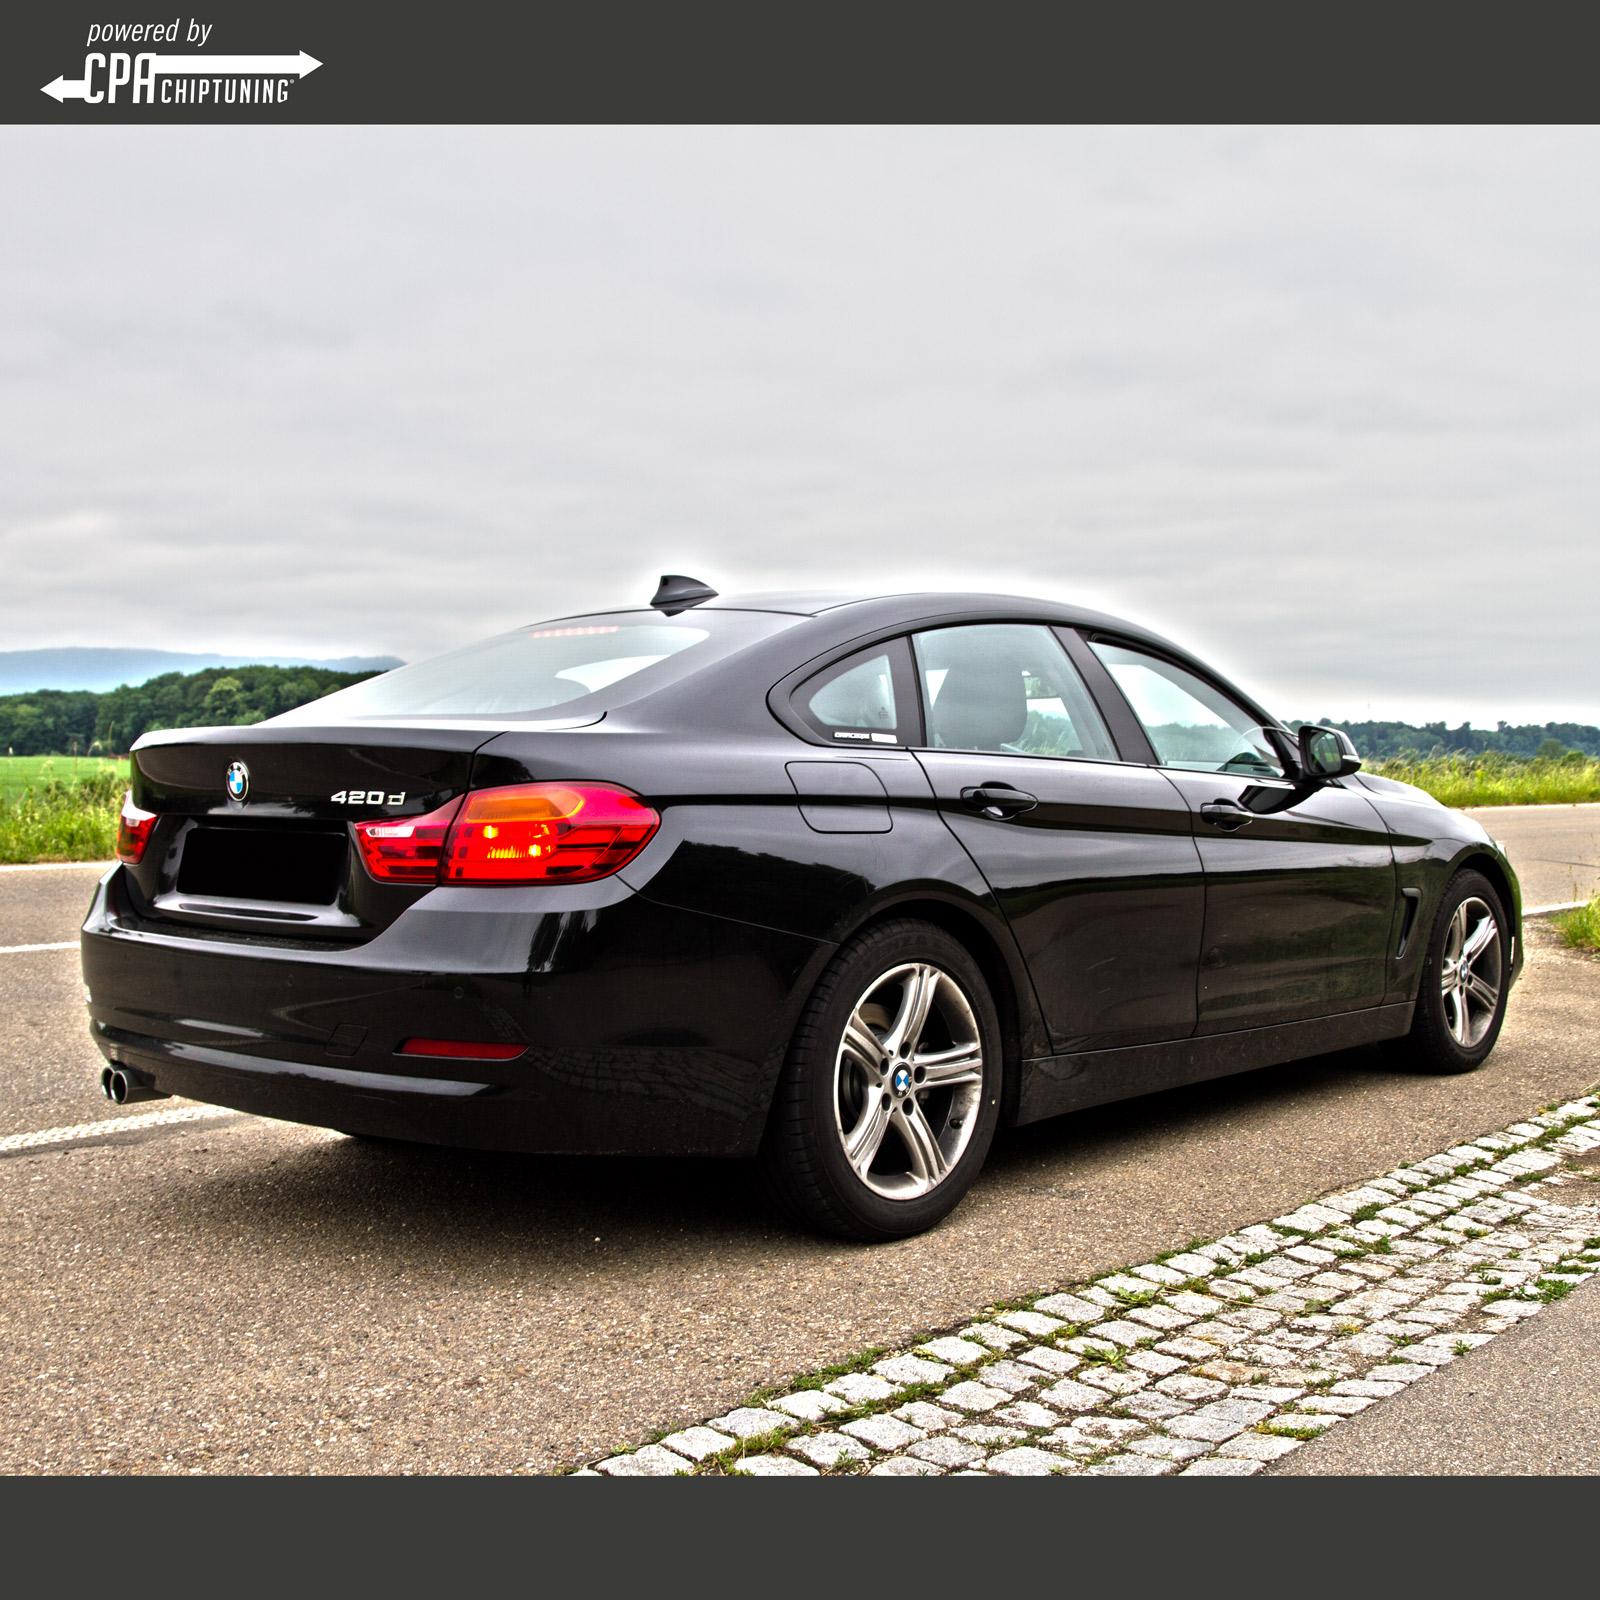 Bmw X6 Tuned: Chiptuning Chiptuning Beim BMW X6 M50d